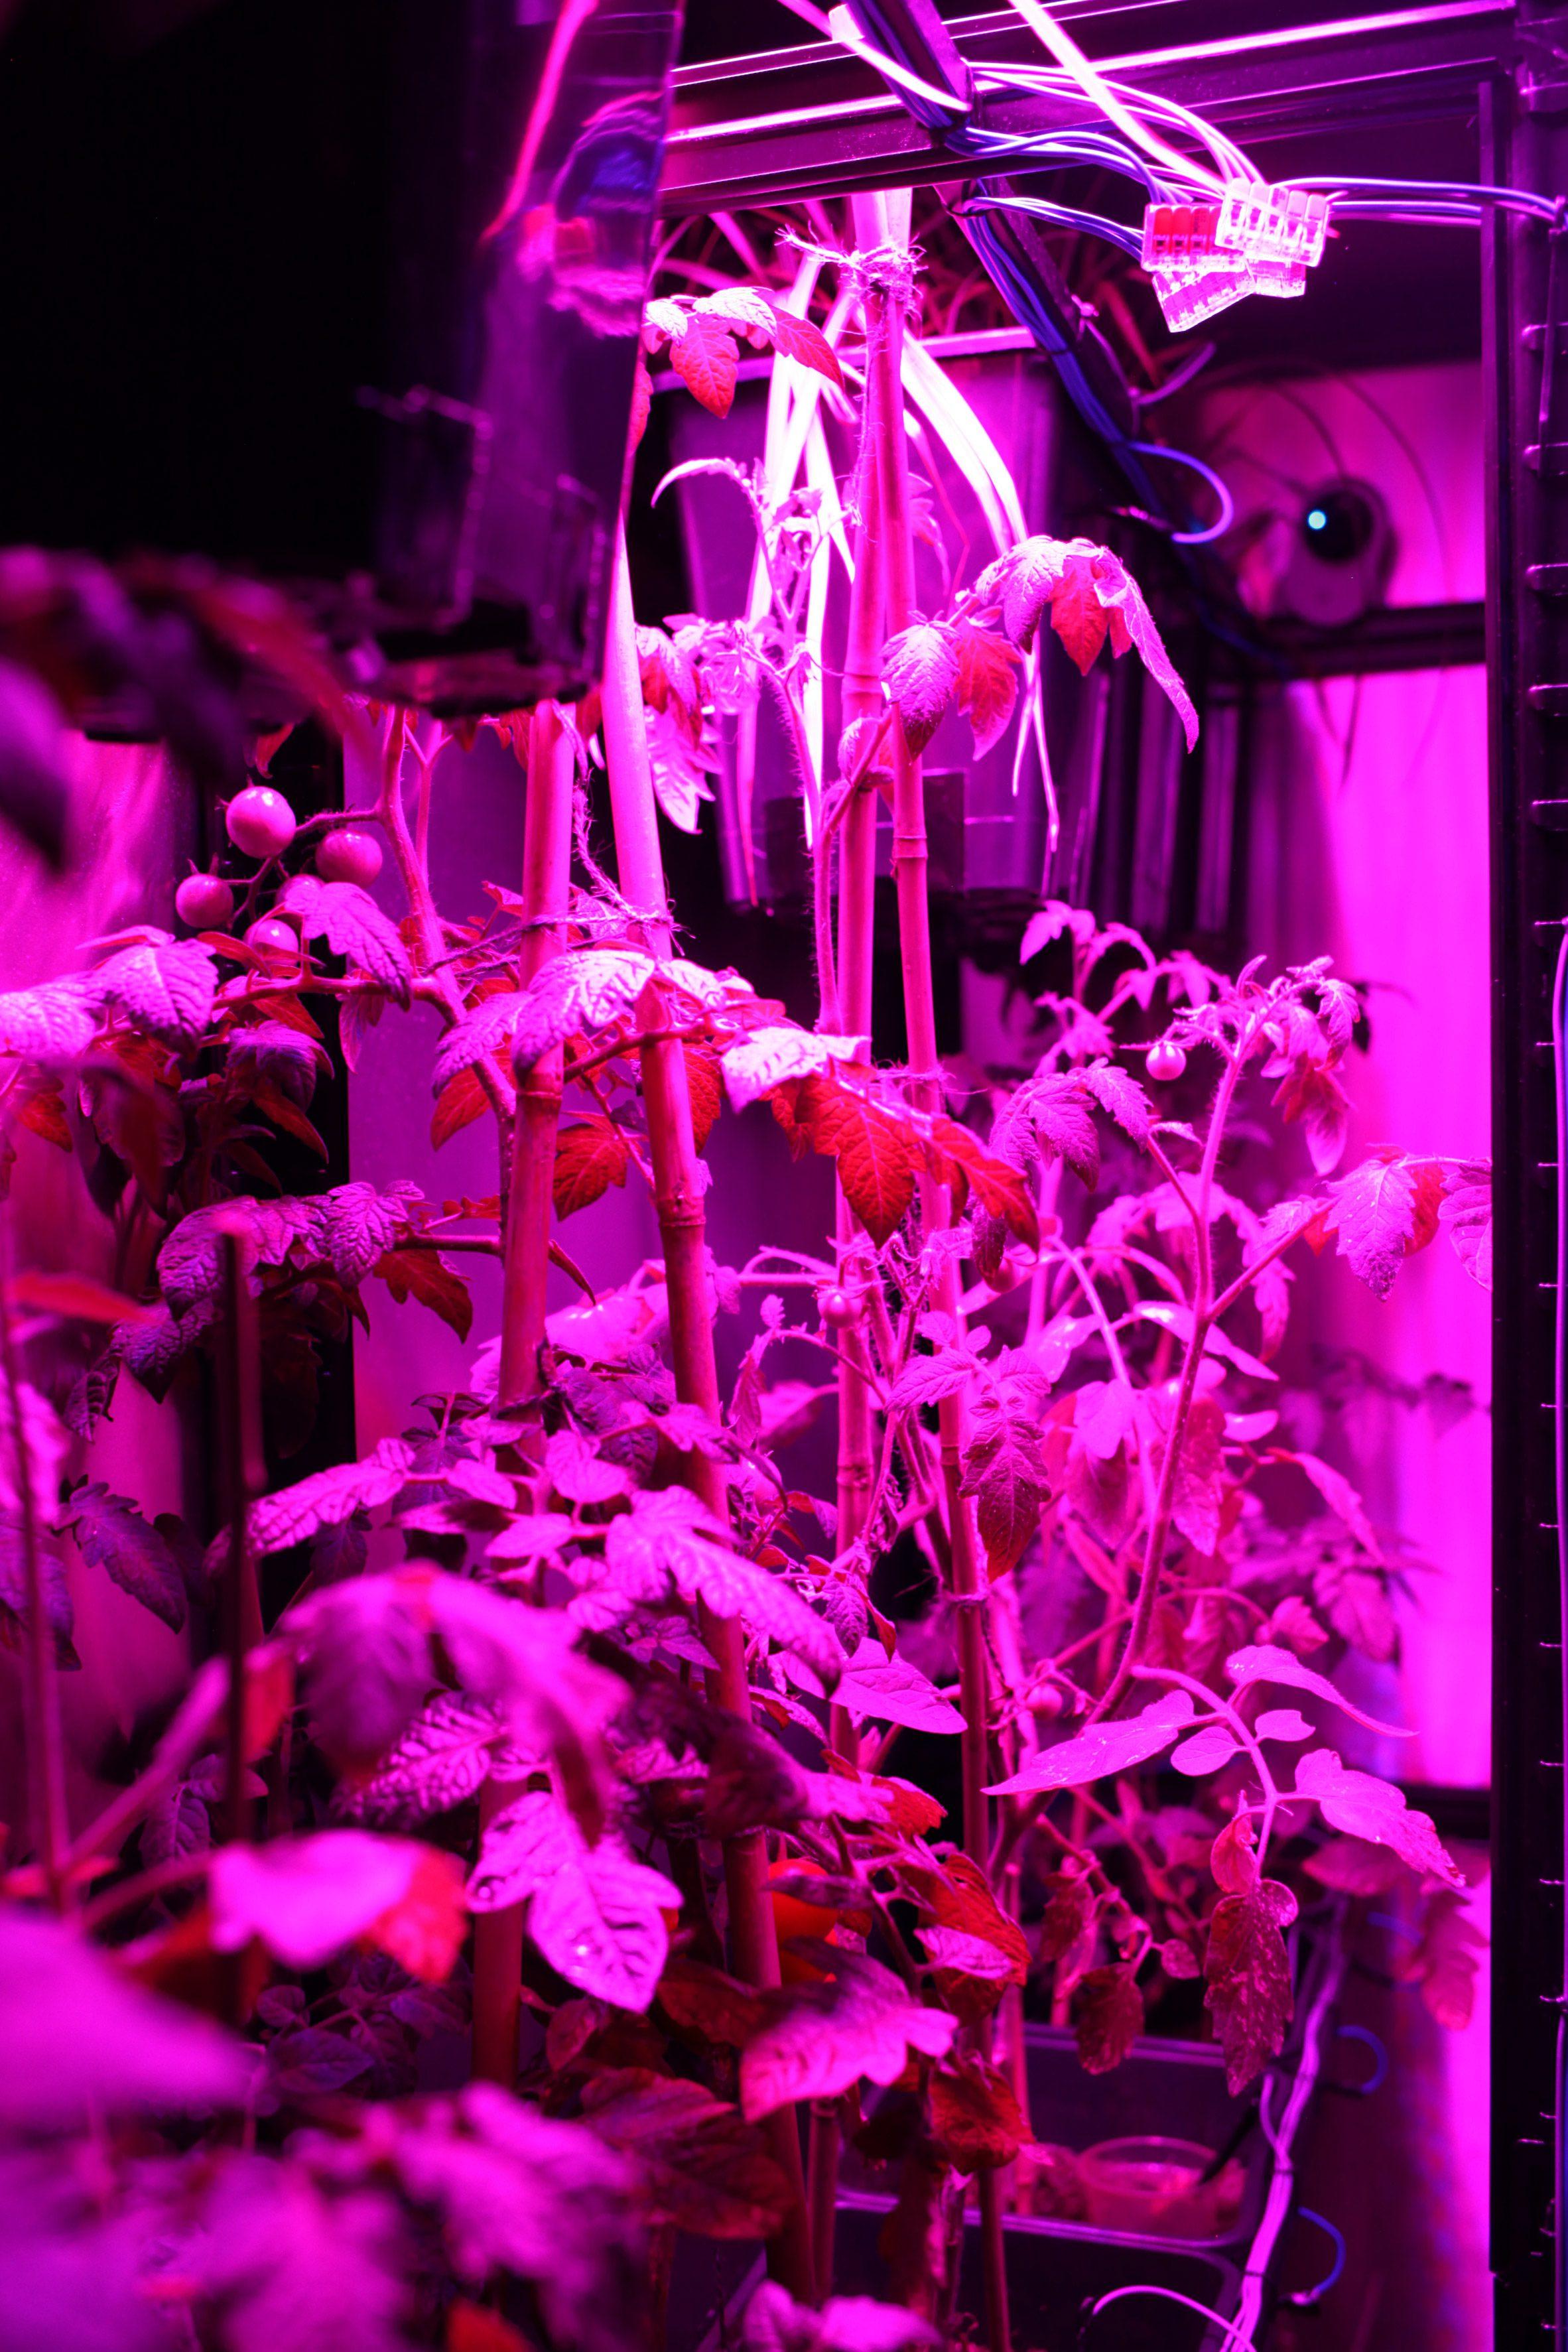 Tomato plants under a grow light